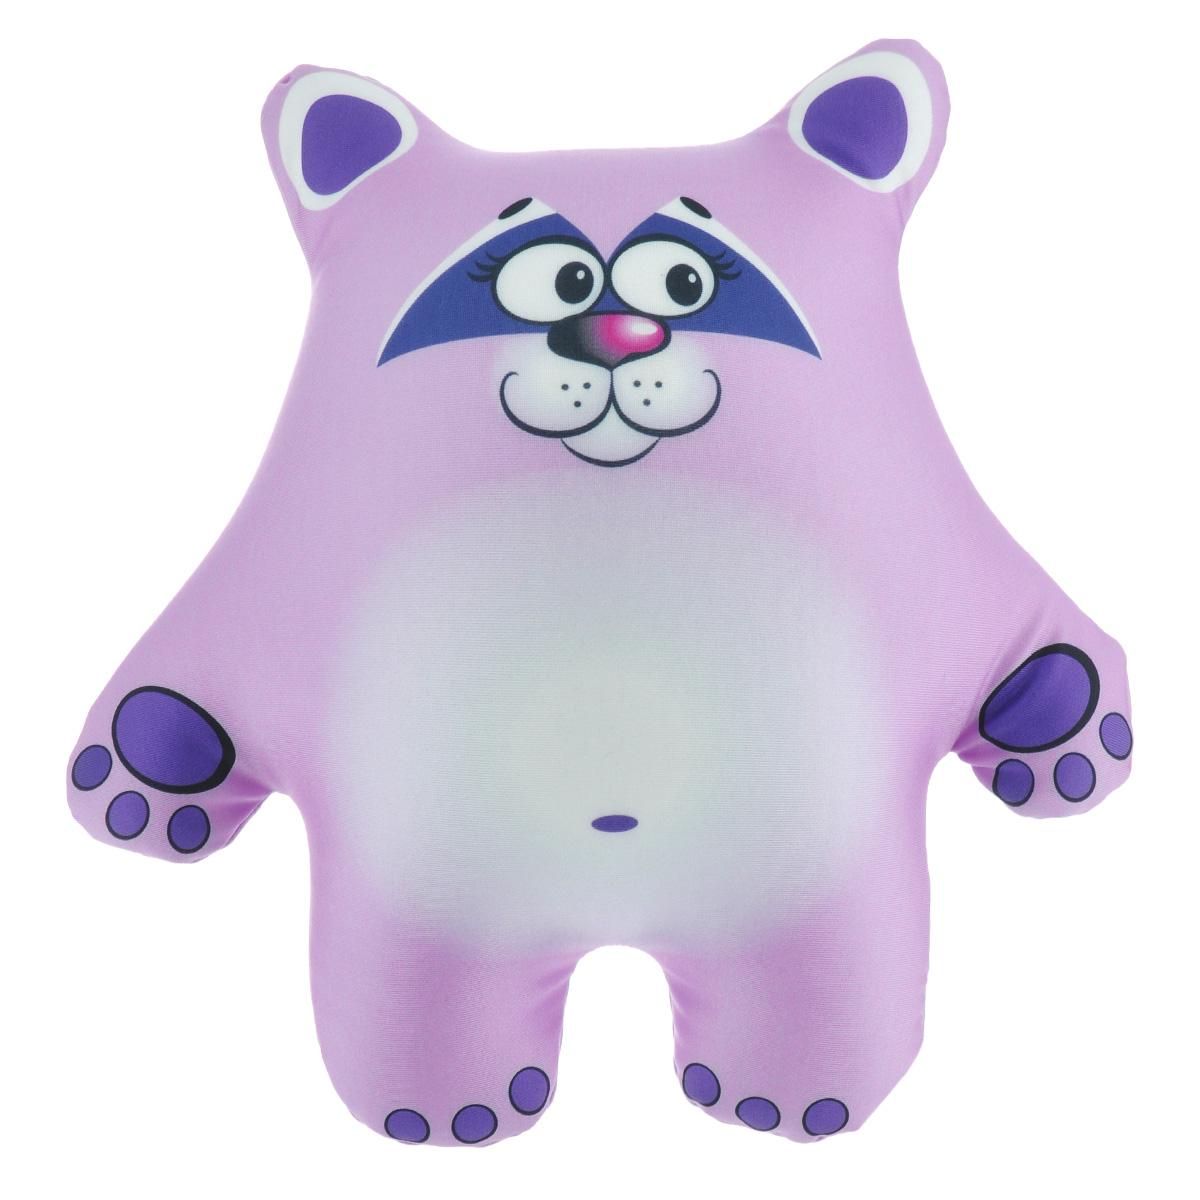 Игрушка-антистресс СмолТойс Енотик, 30 см игрушка антистресс смолтойс кукла анюта 30 см